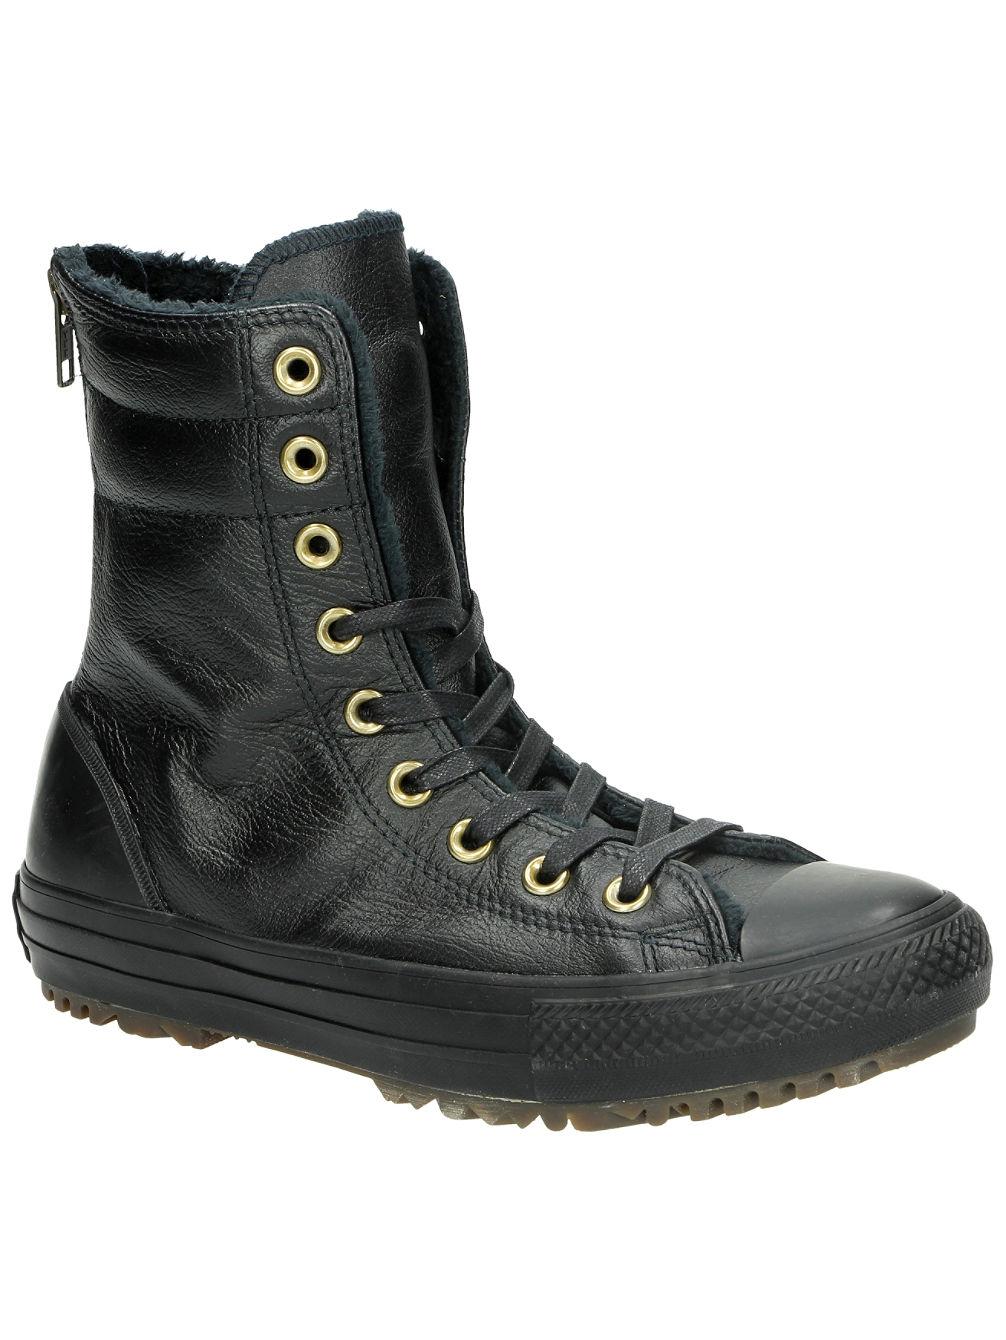 buy popular 9c5f0 9d534 Chuck Taylor All Star Hi-Rise Sneakers Women. Converse